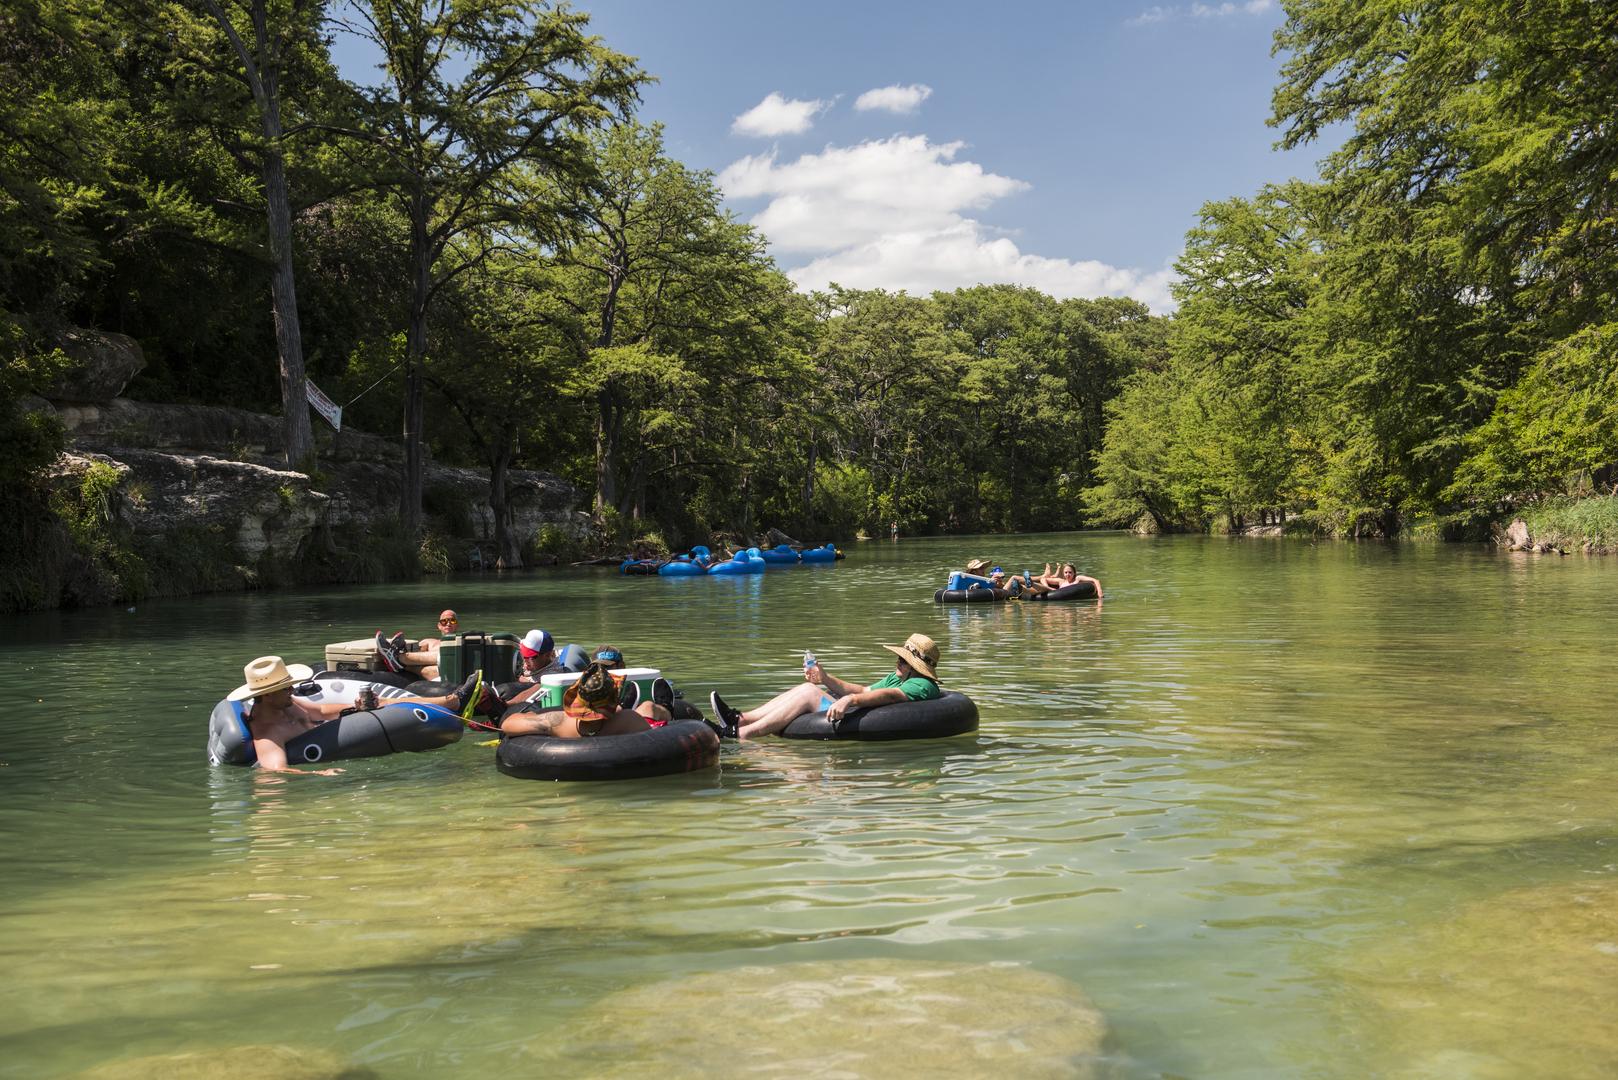 Concan River Lodging - Cabin Rentals, Rental Homes, Vacation